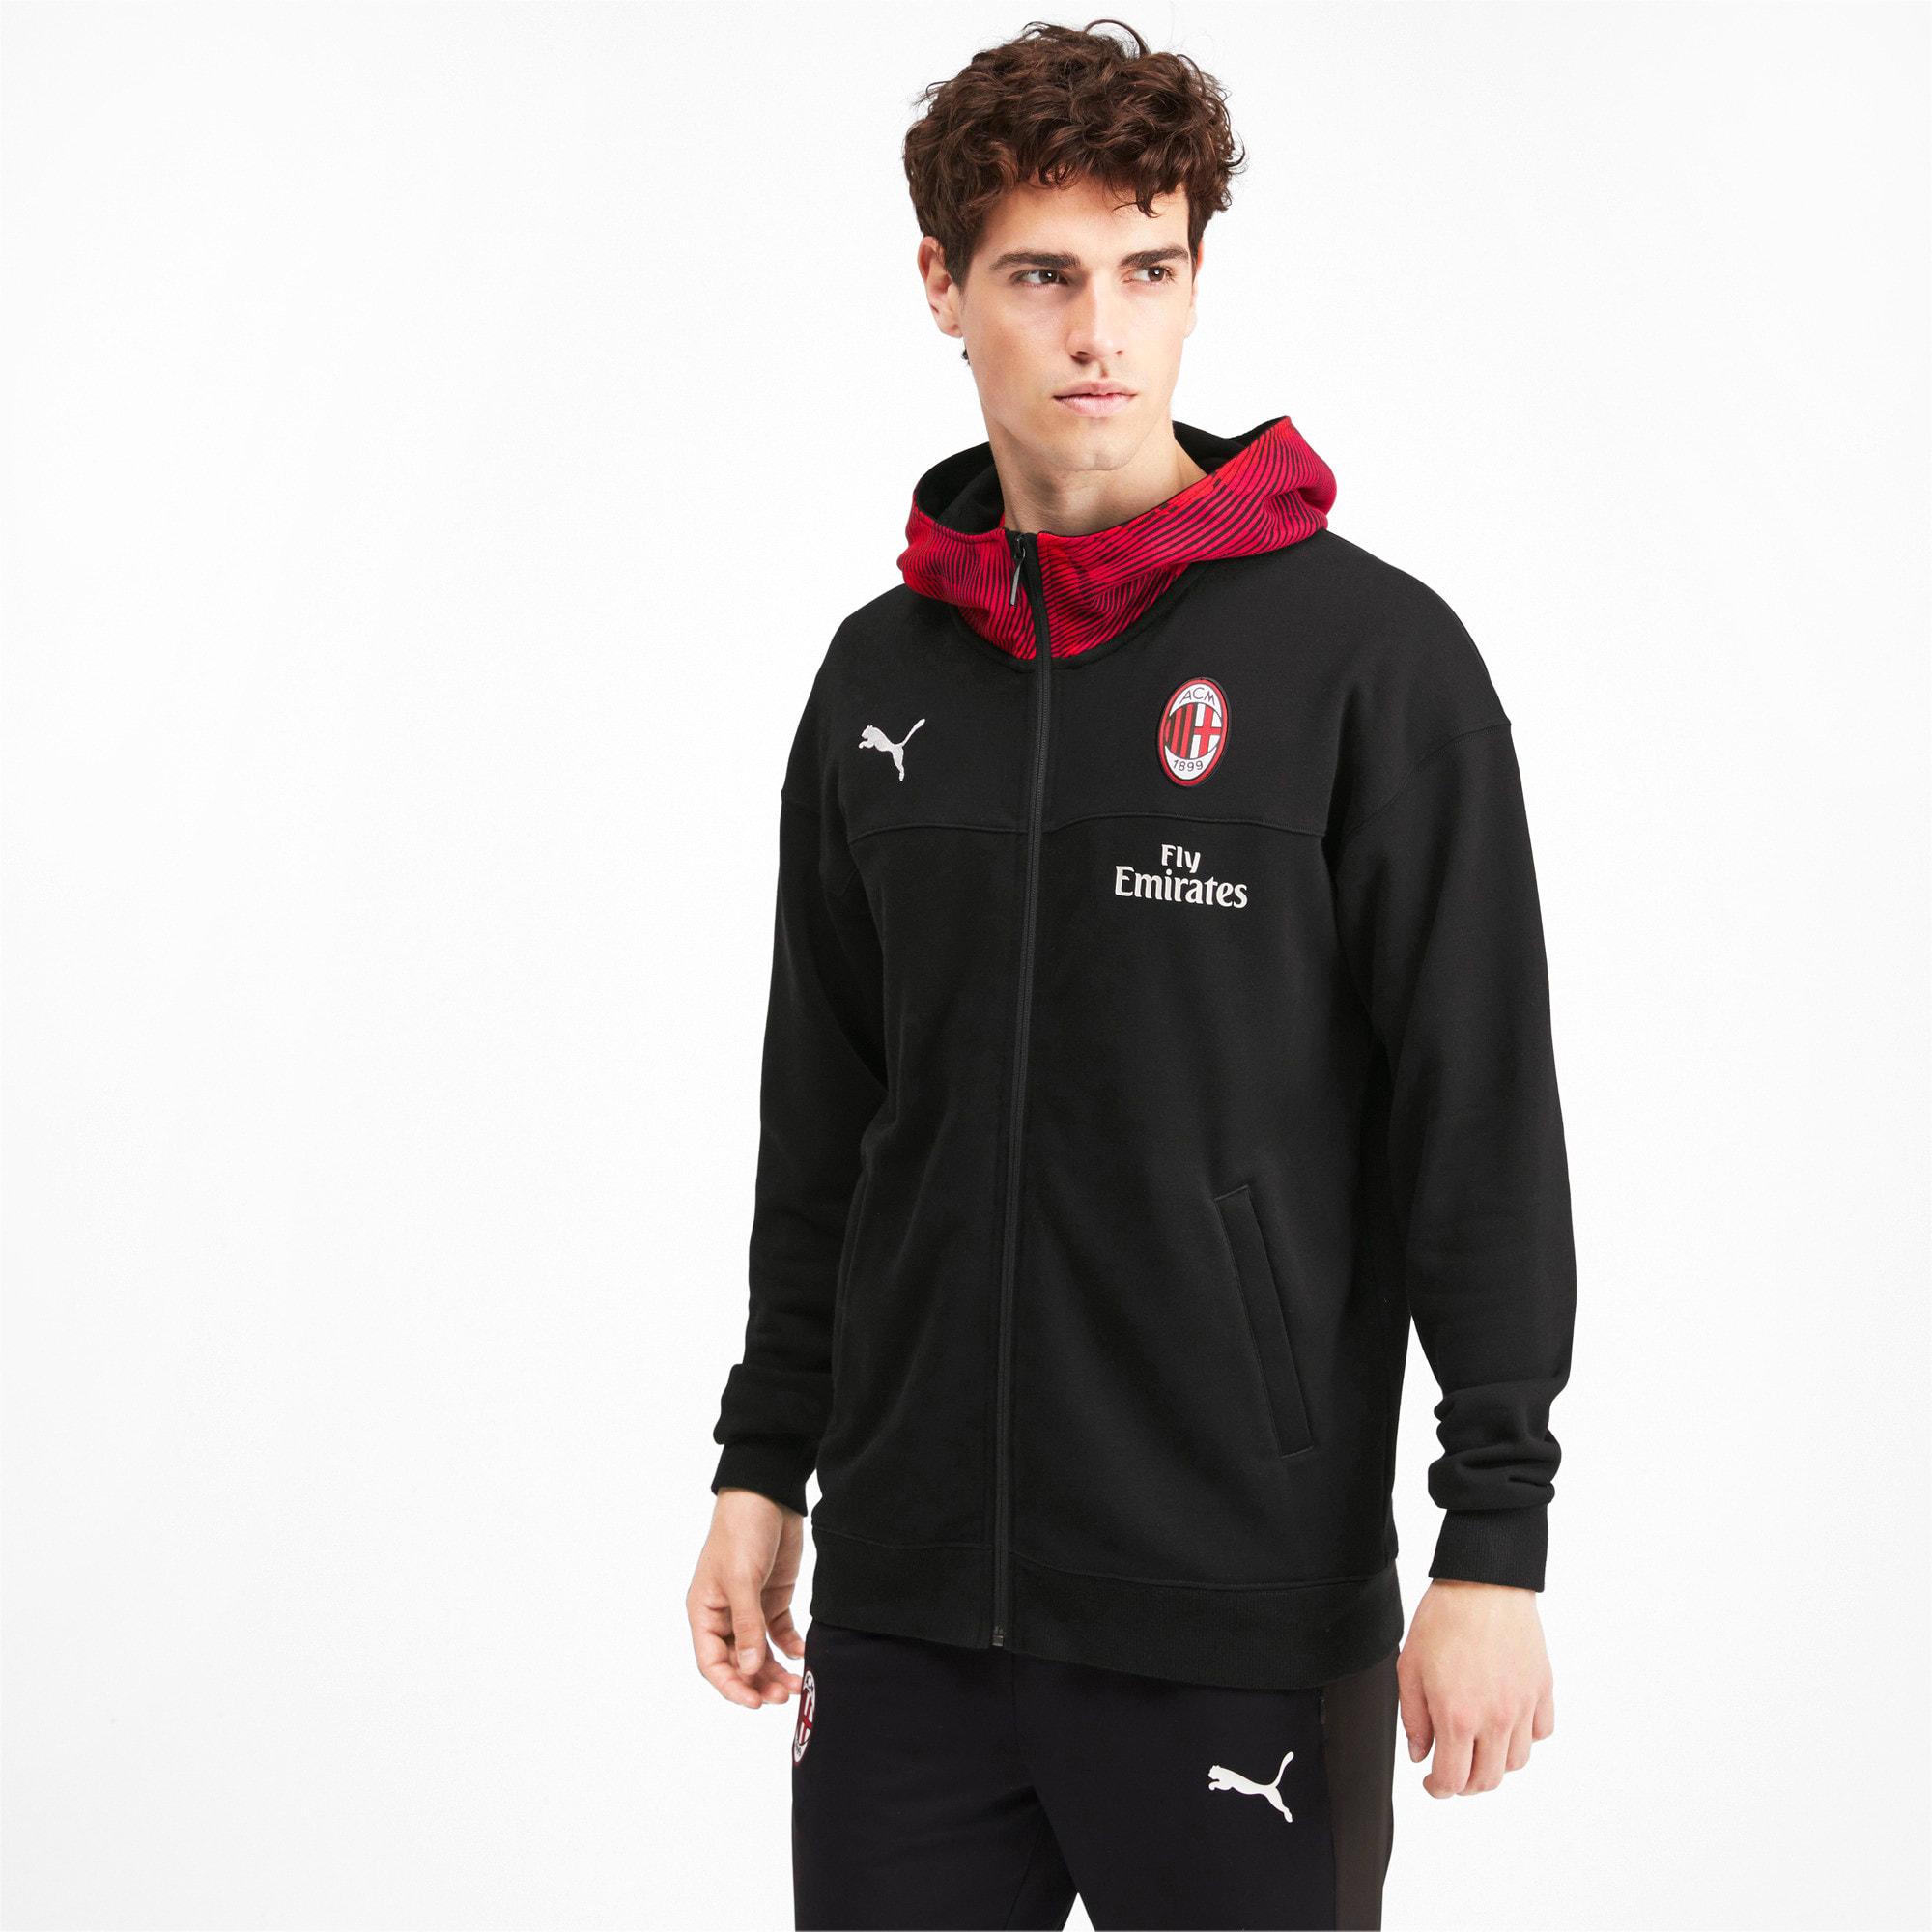 Thumbnail 1 of AC Milan Casuals Men's Hoodie, Puma Black-Tango Red, medium